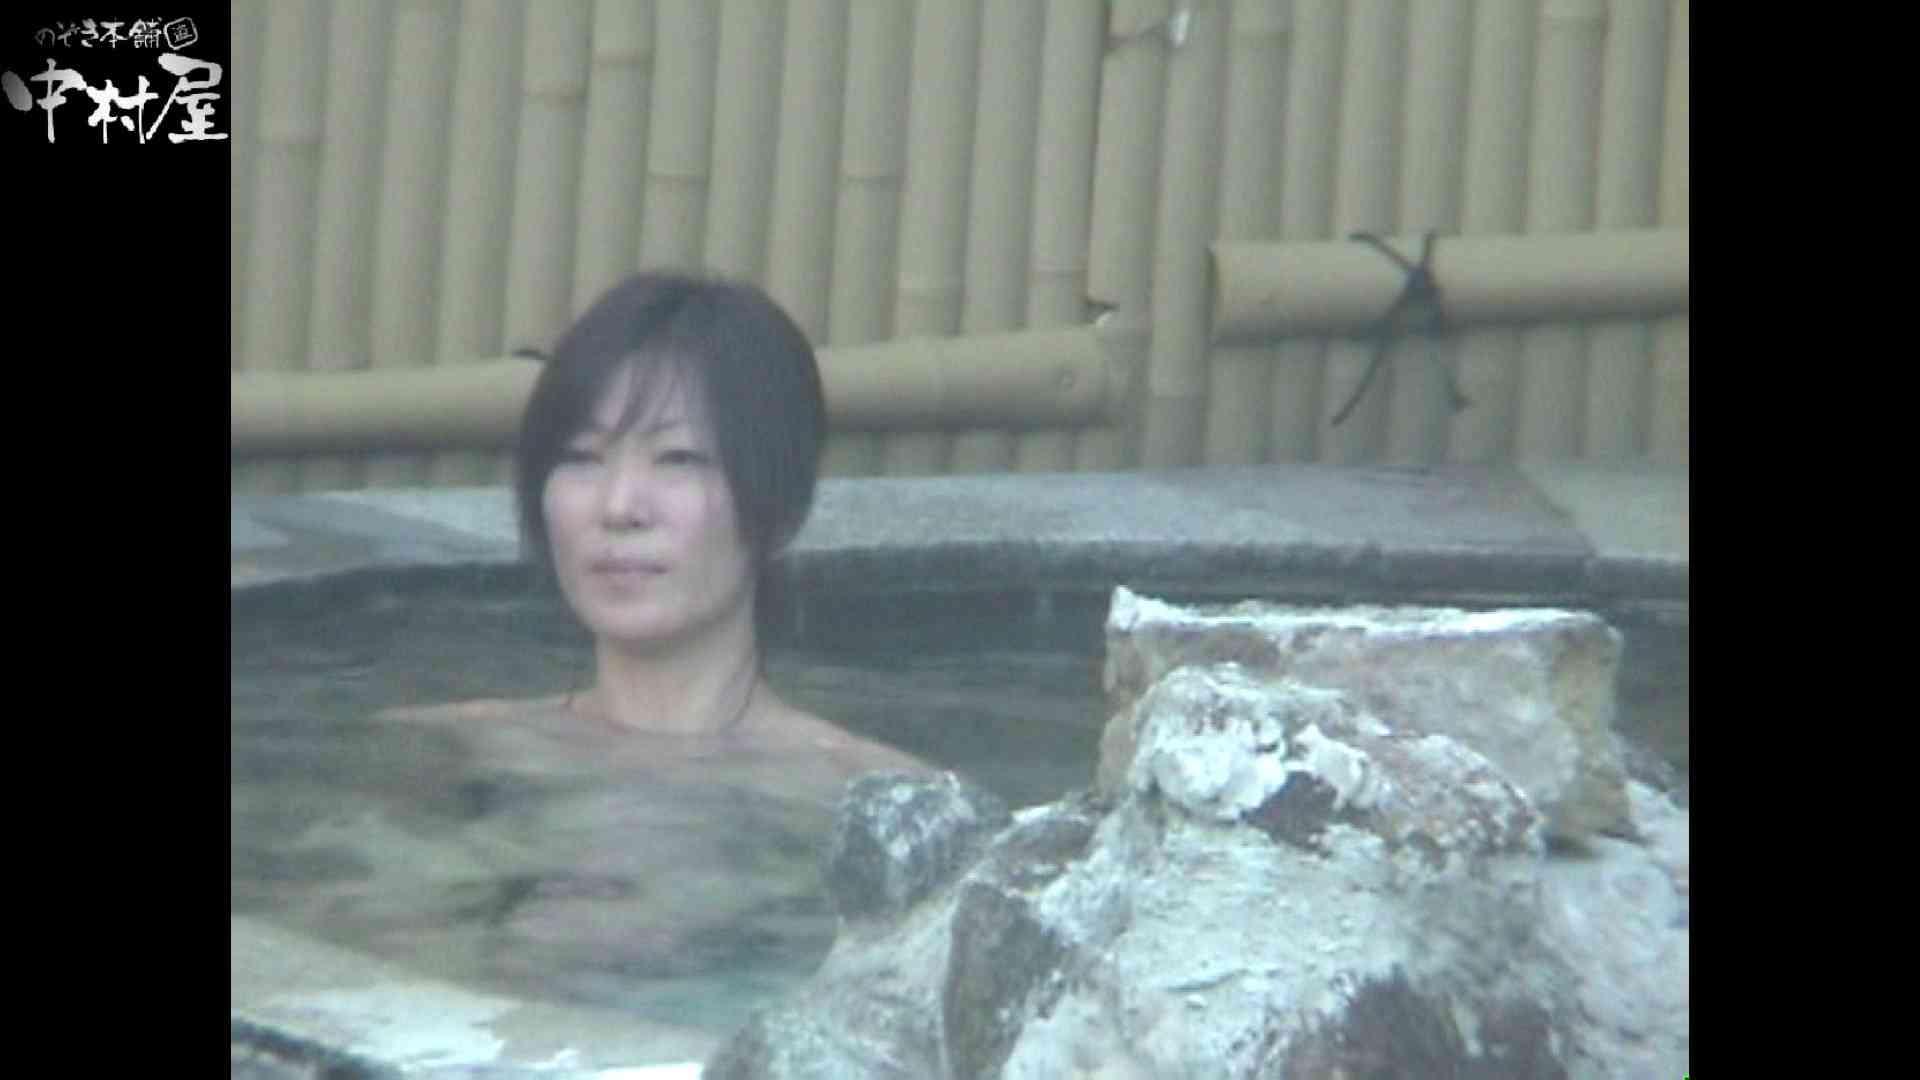 Aquaな露天風呂Vol.972 0  77連発 24